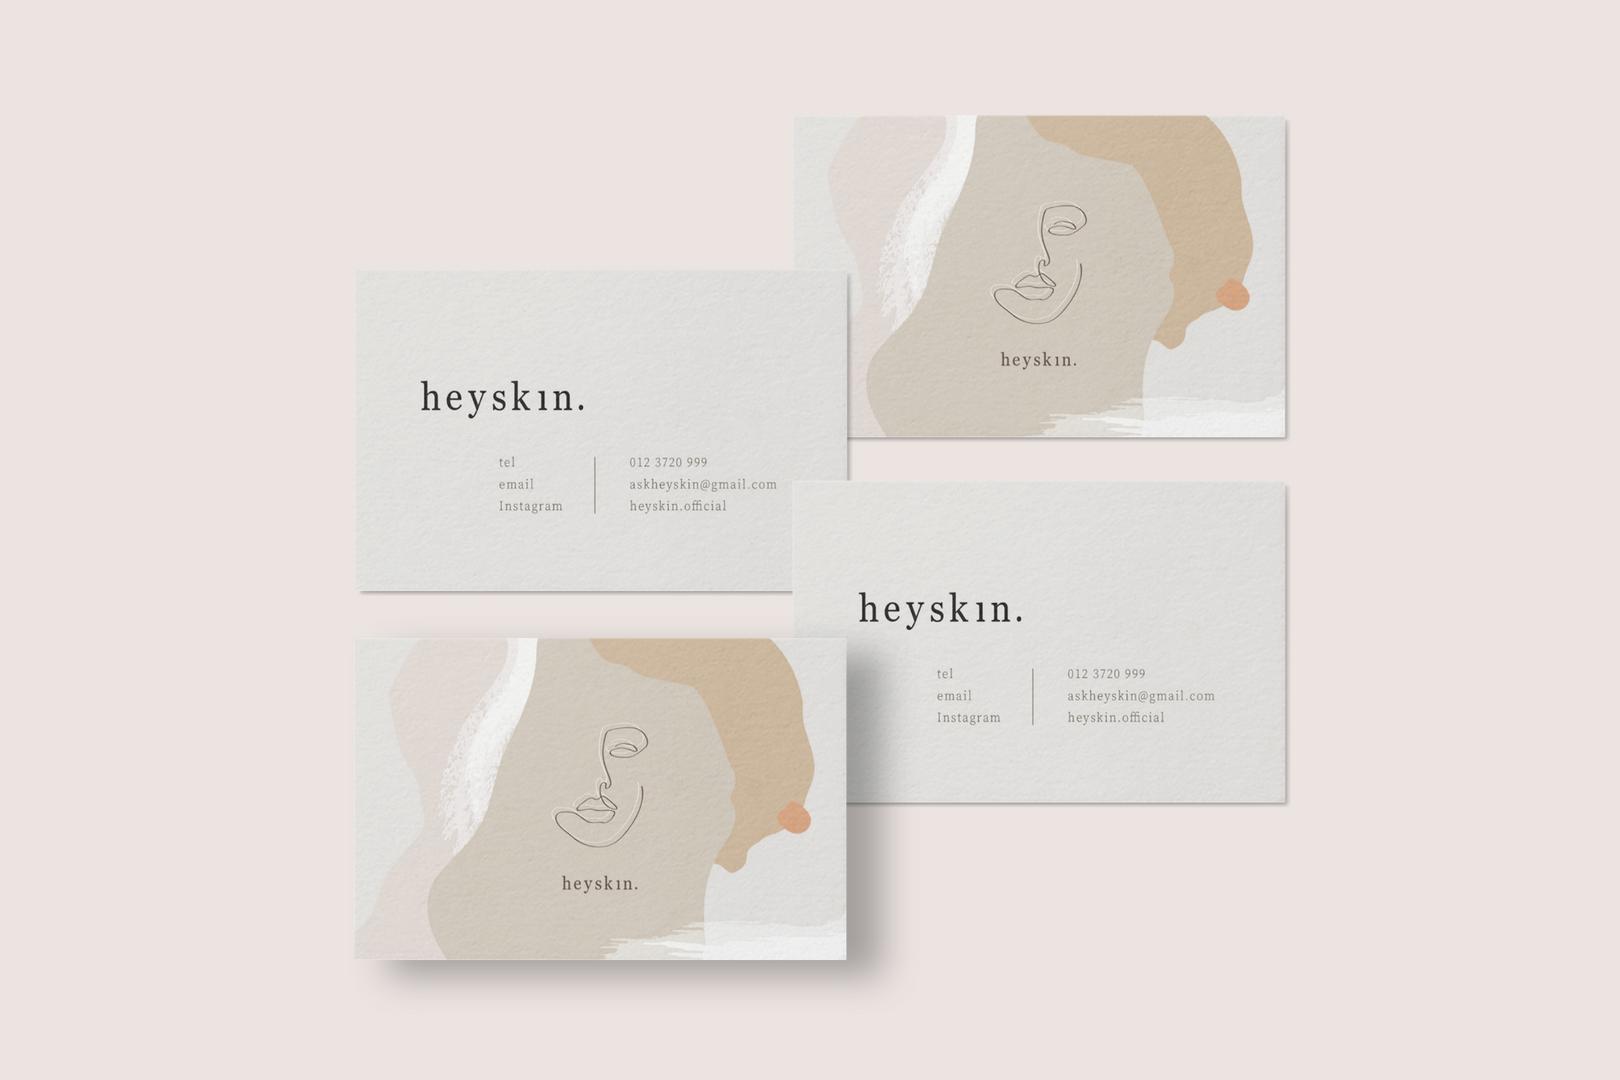 HeySkin Press Pack